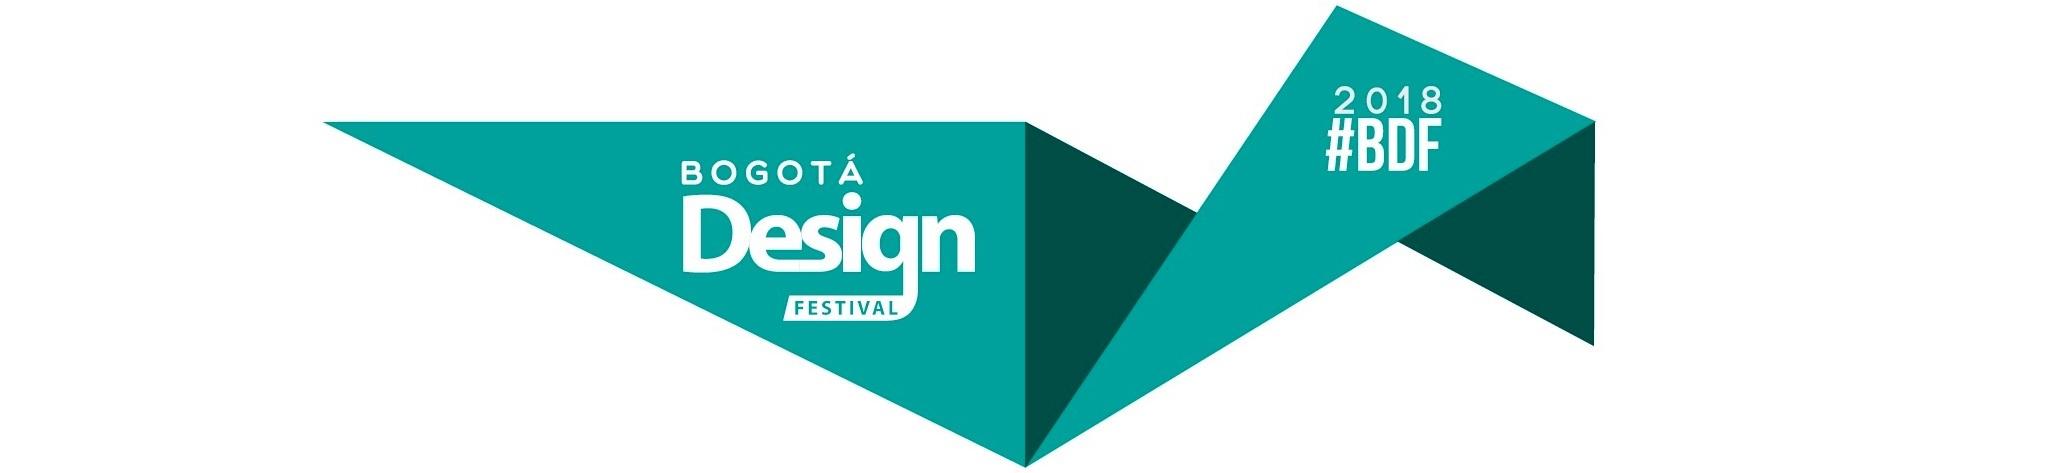 Logo_bdf2018_banner